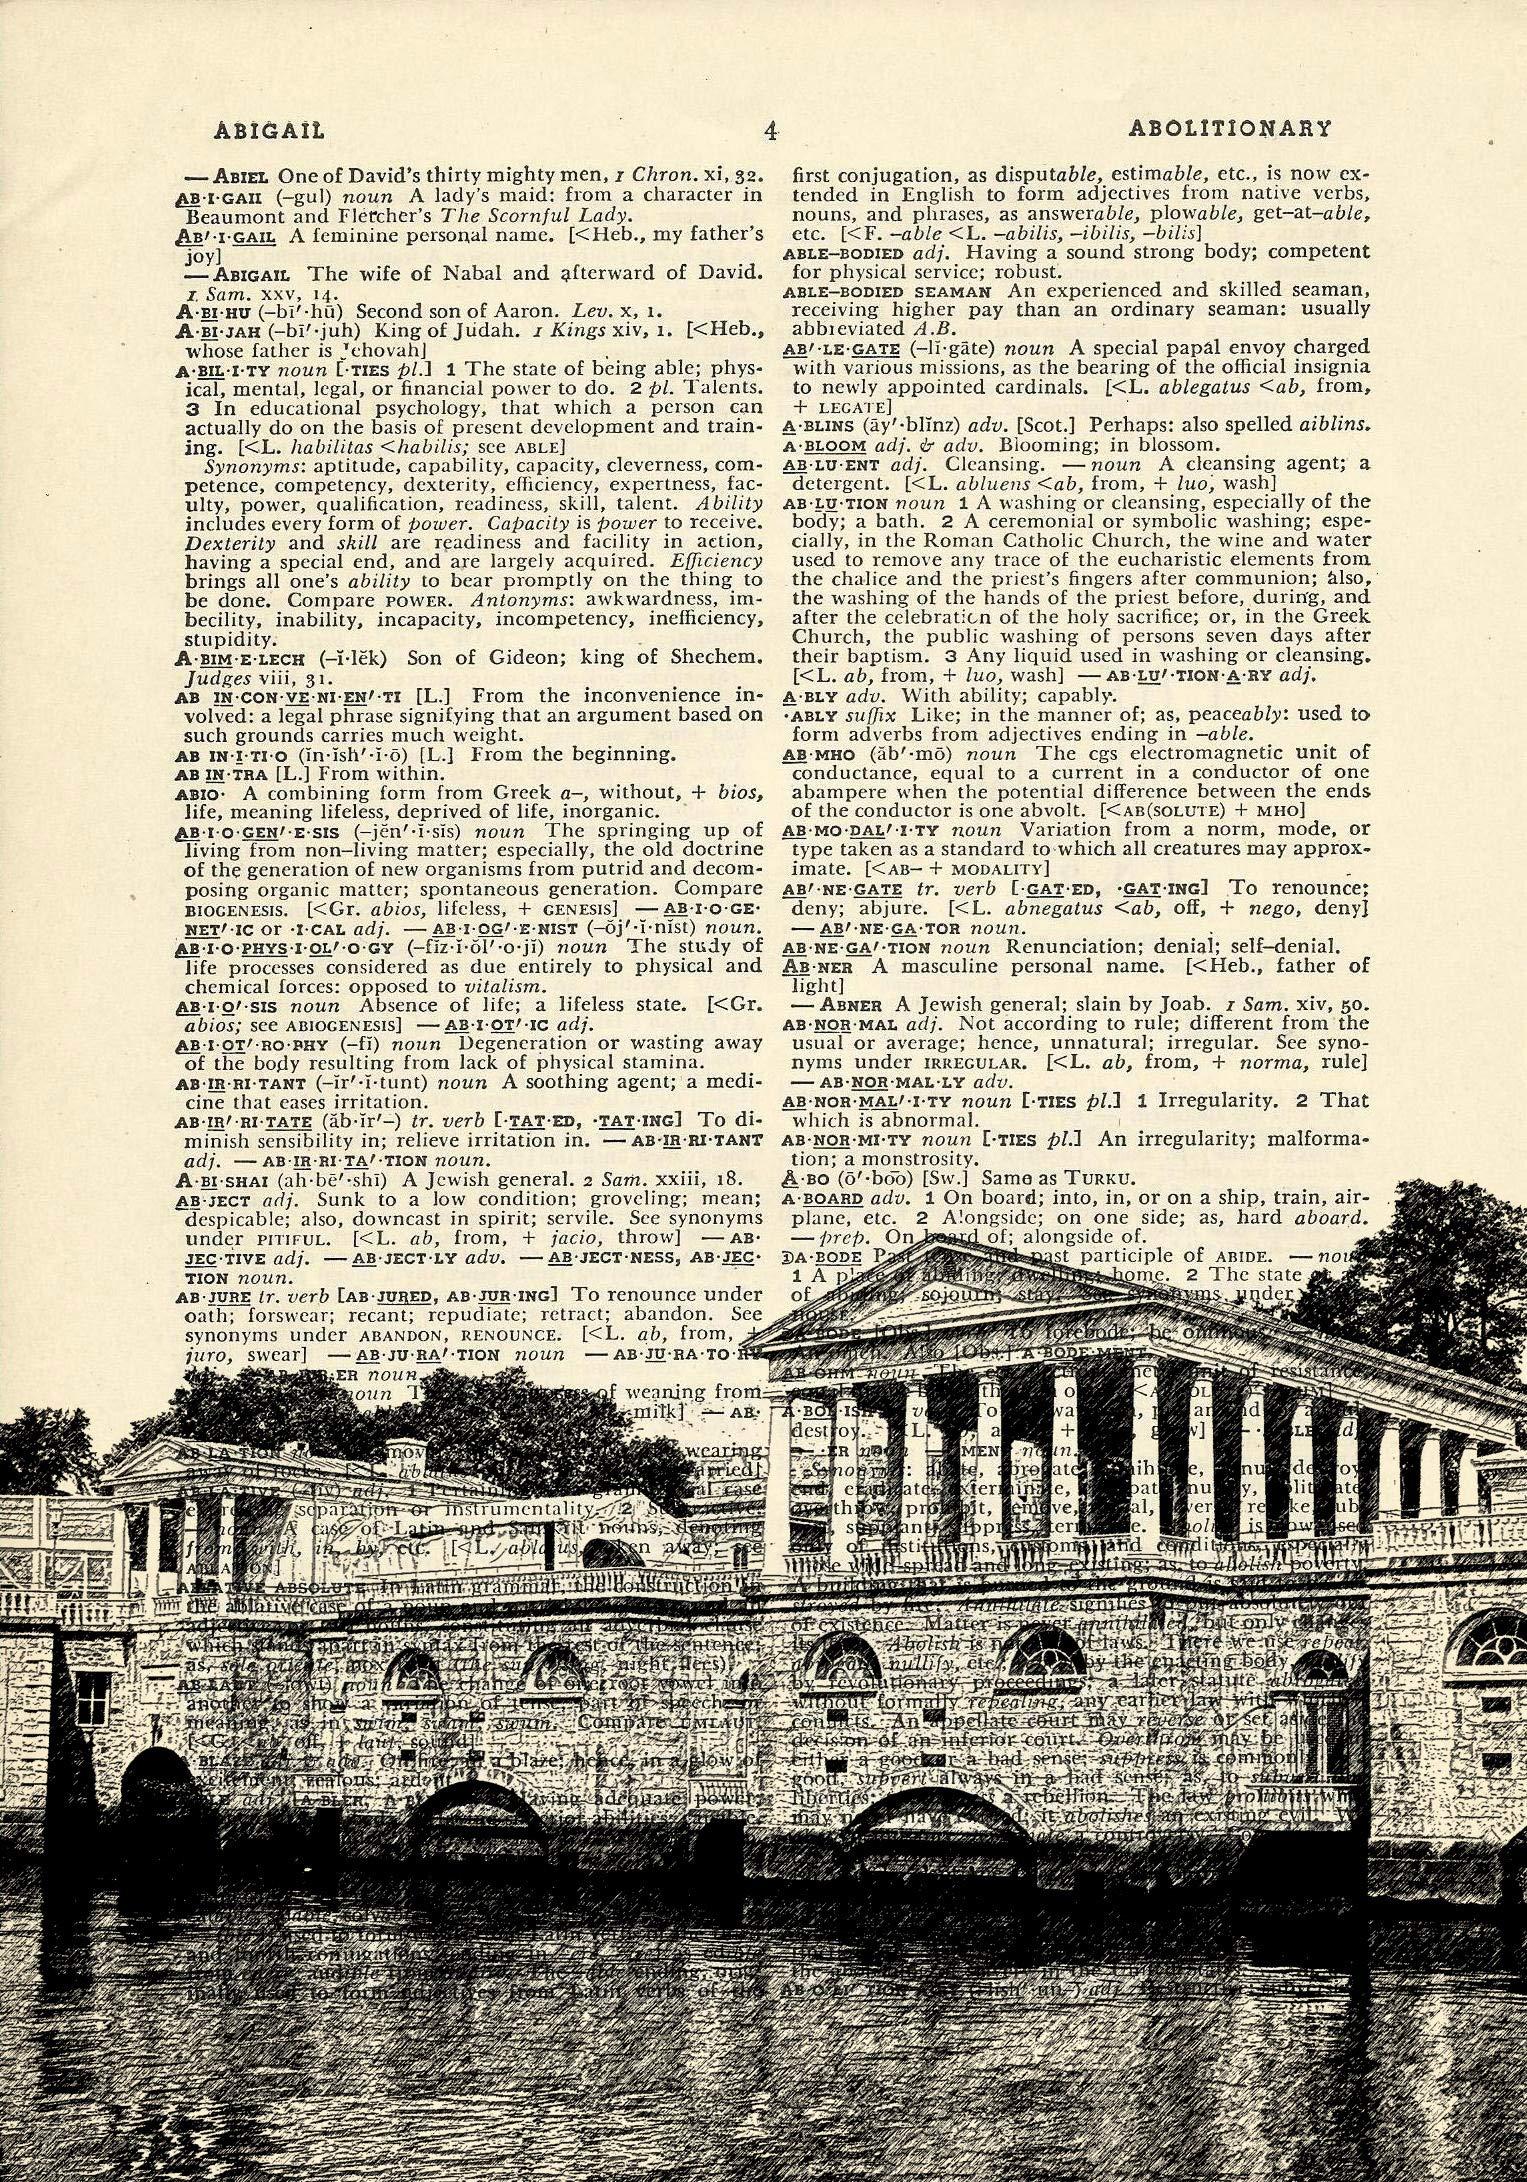 Fairmount Water Works Philadelphia Printed on Dictionary Paper